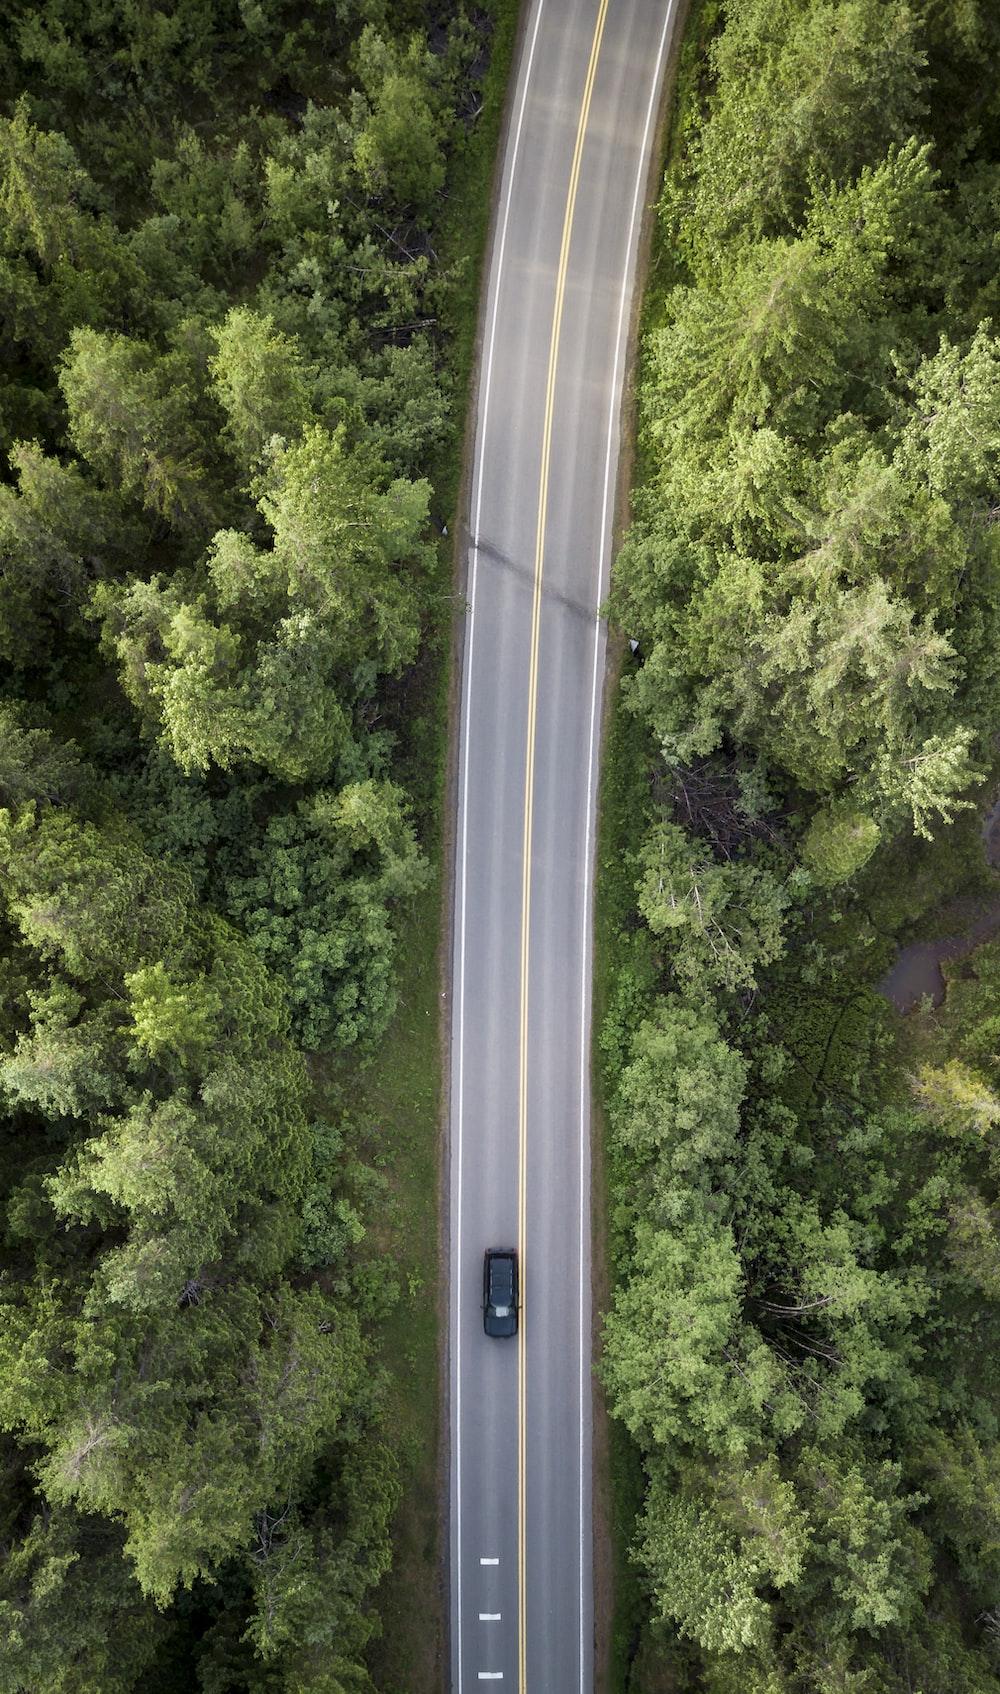 aerial view of black vehicle on gray asphalt road during daytime